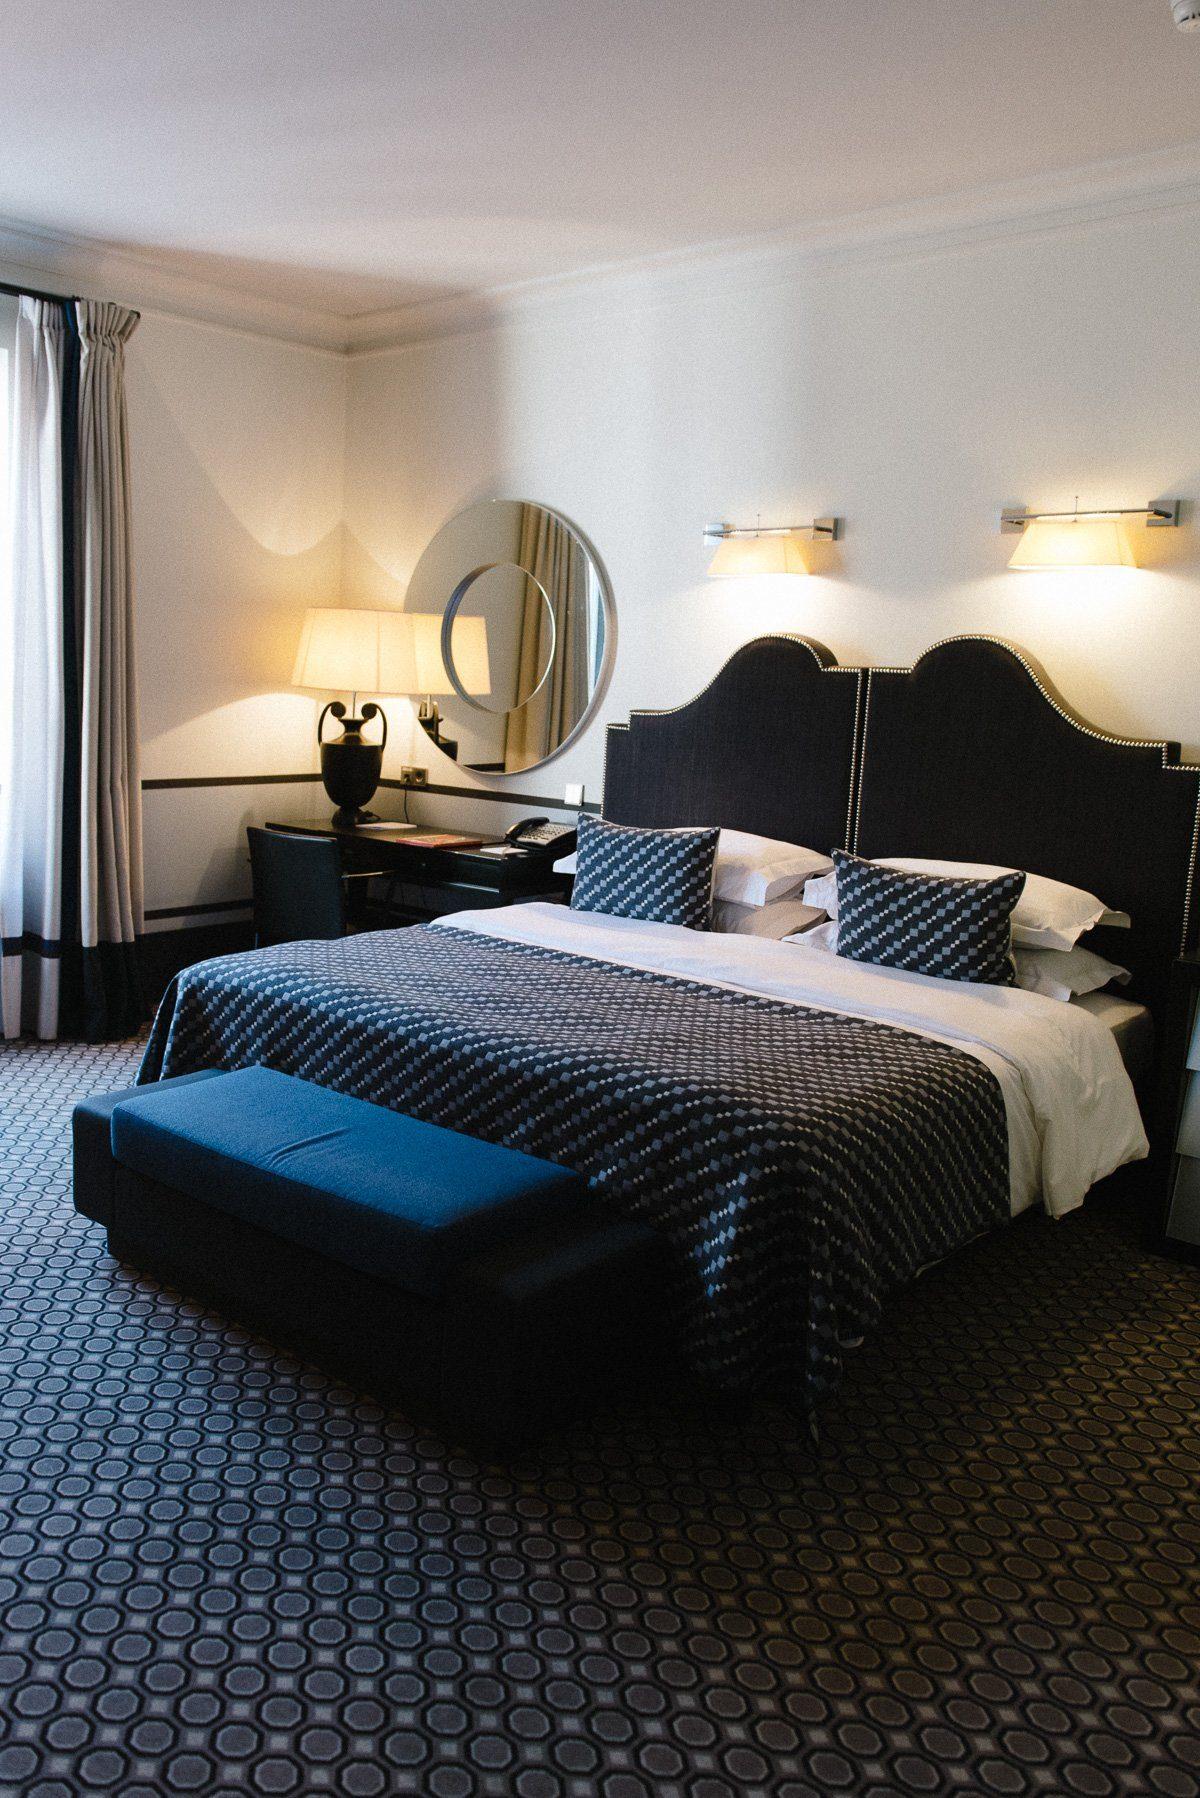 Zimmer im Hotel de Rome